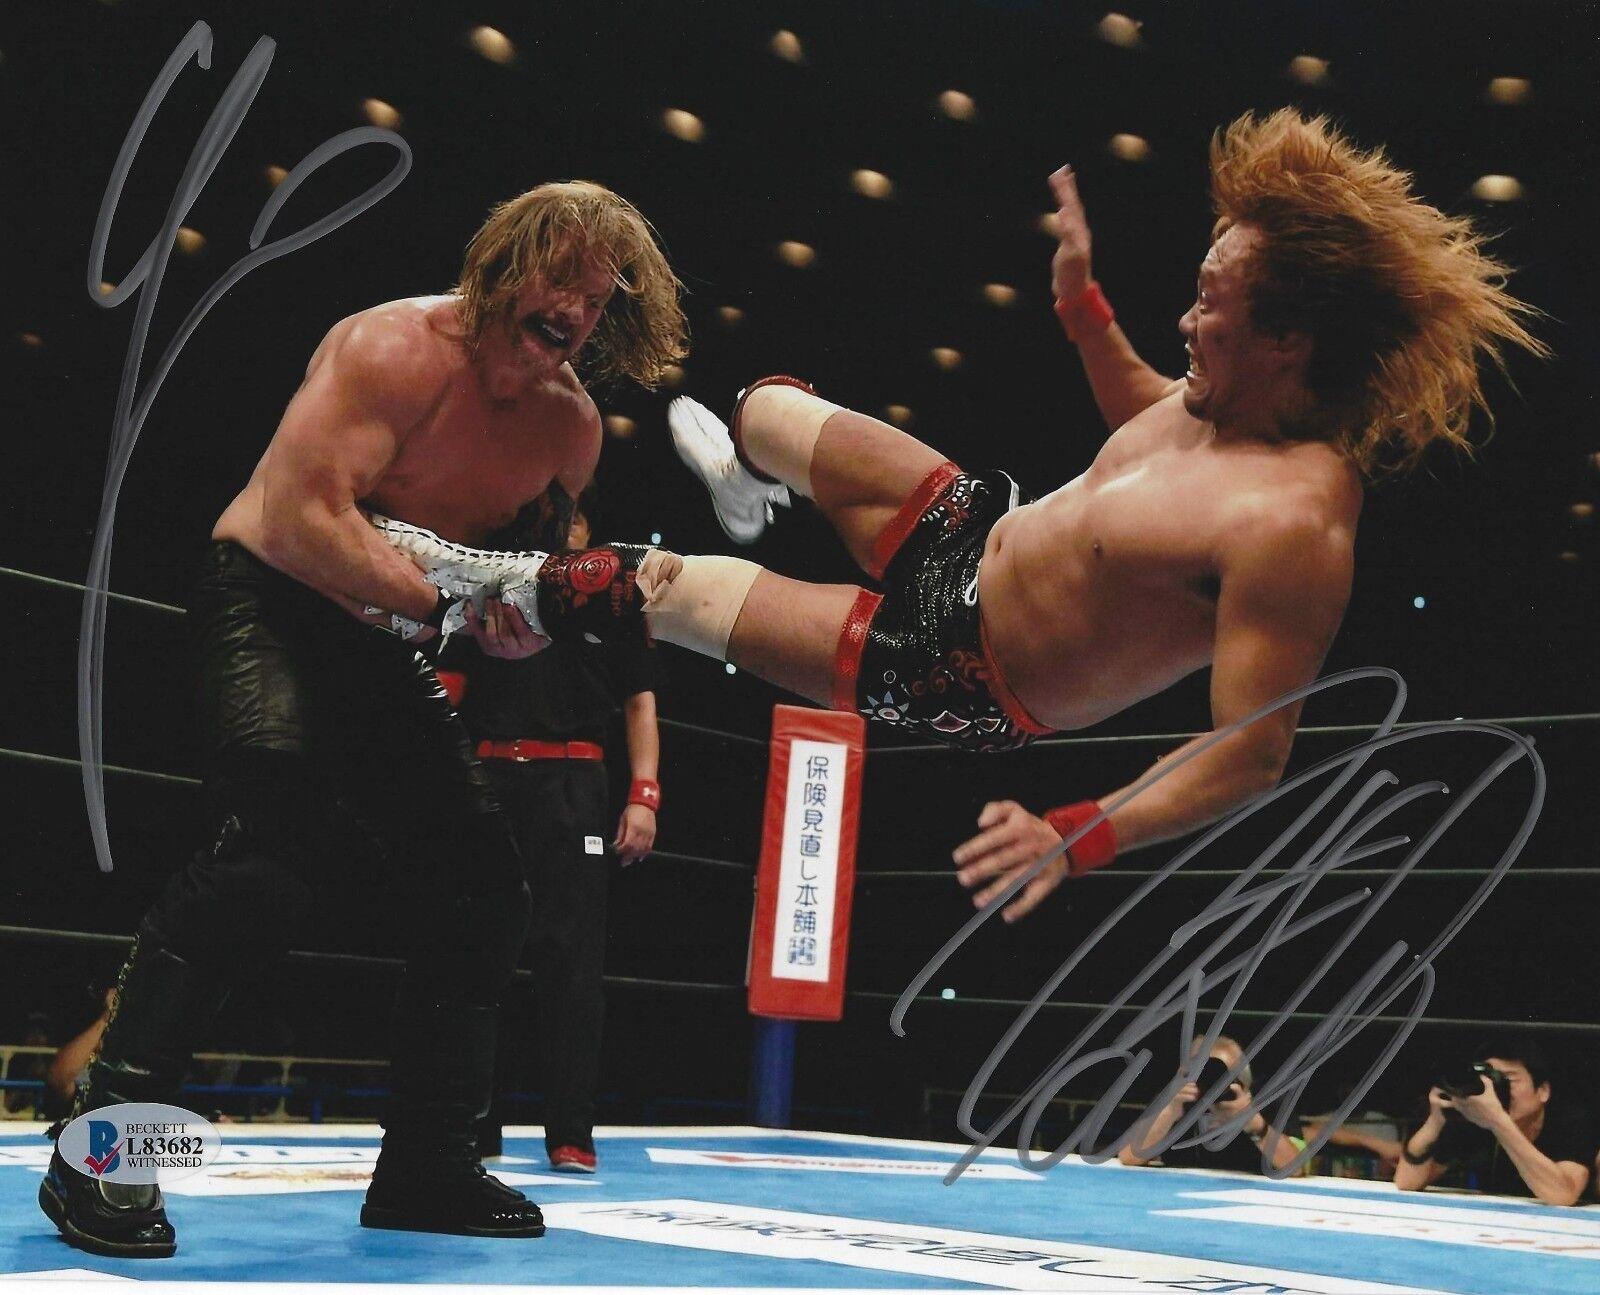 Tetsuya Hairal & Chris Jericho signed 8x10 Photo Bas cert. de autenticidad New Japan Pro Wrestling